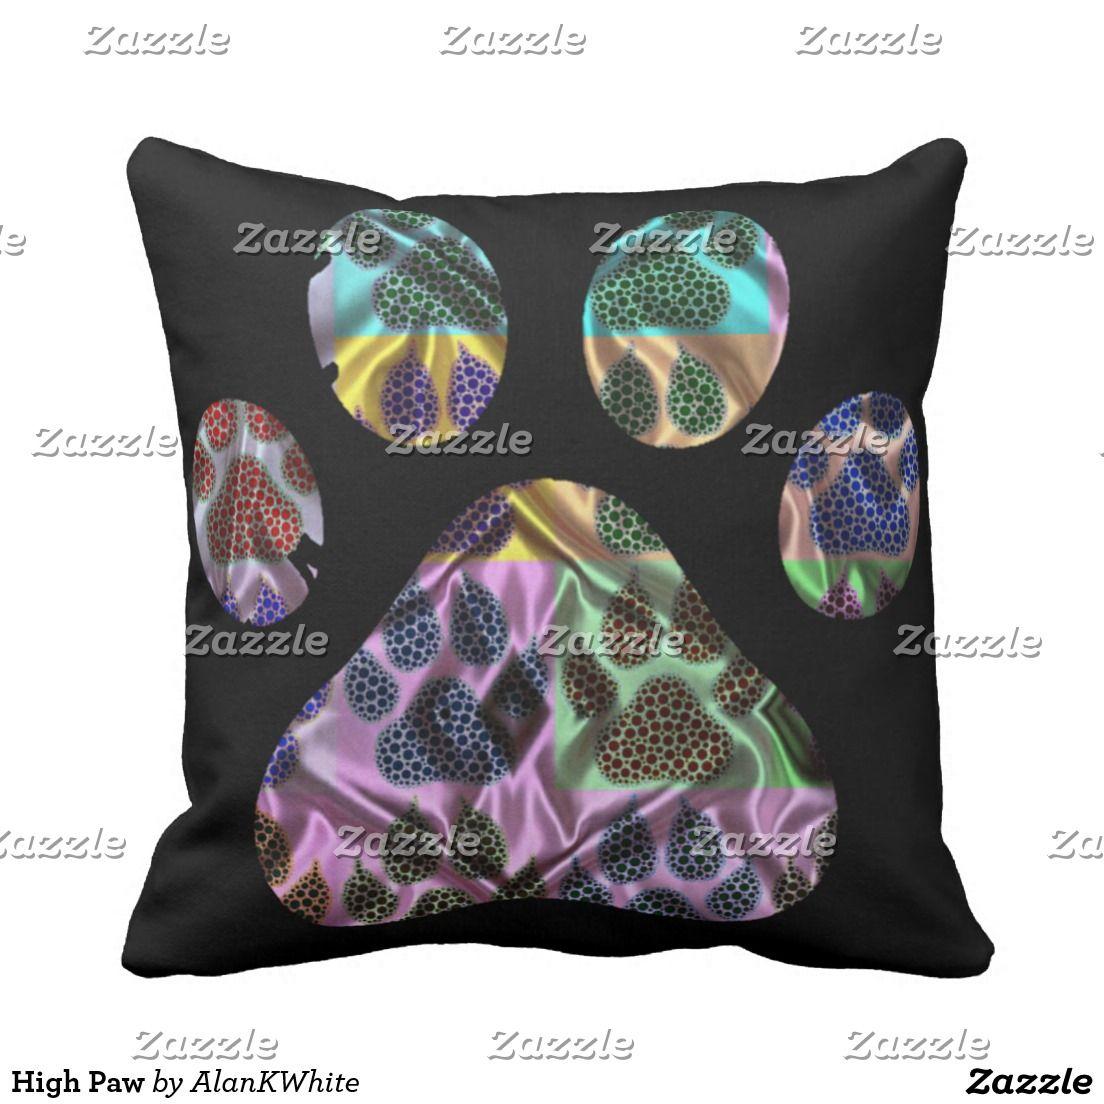 High Paw Outdoor Pillow